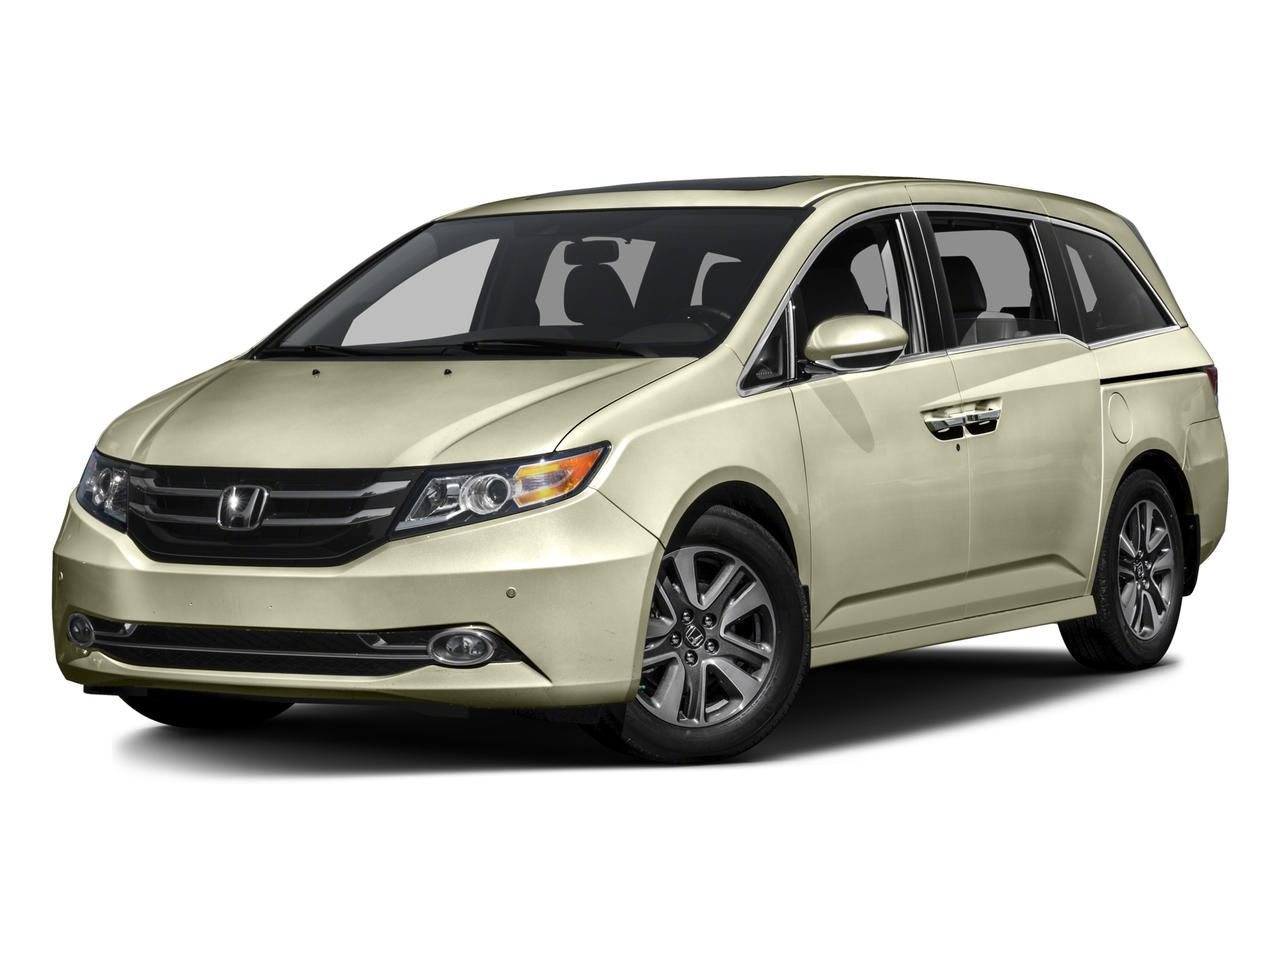 2016 Honda Odyssey Vehicle Photo in Austin, TX 78759